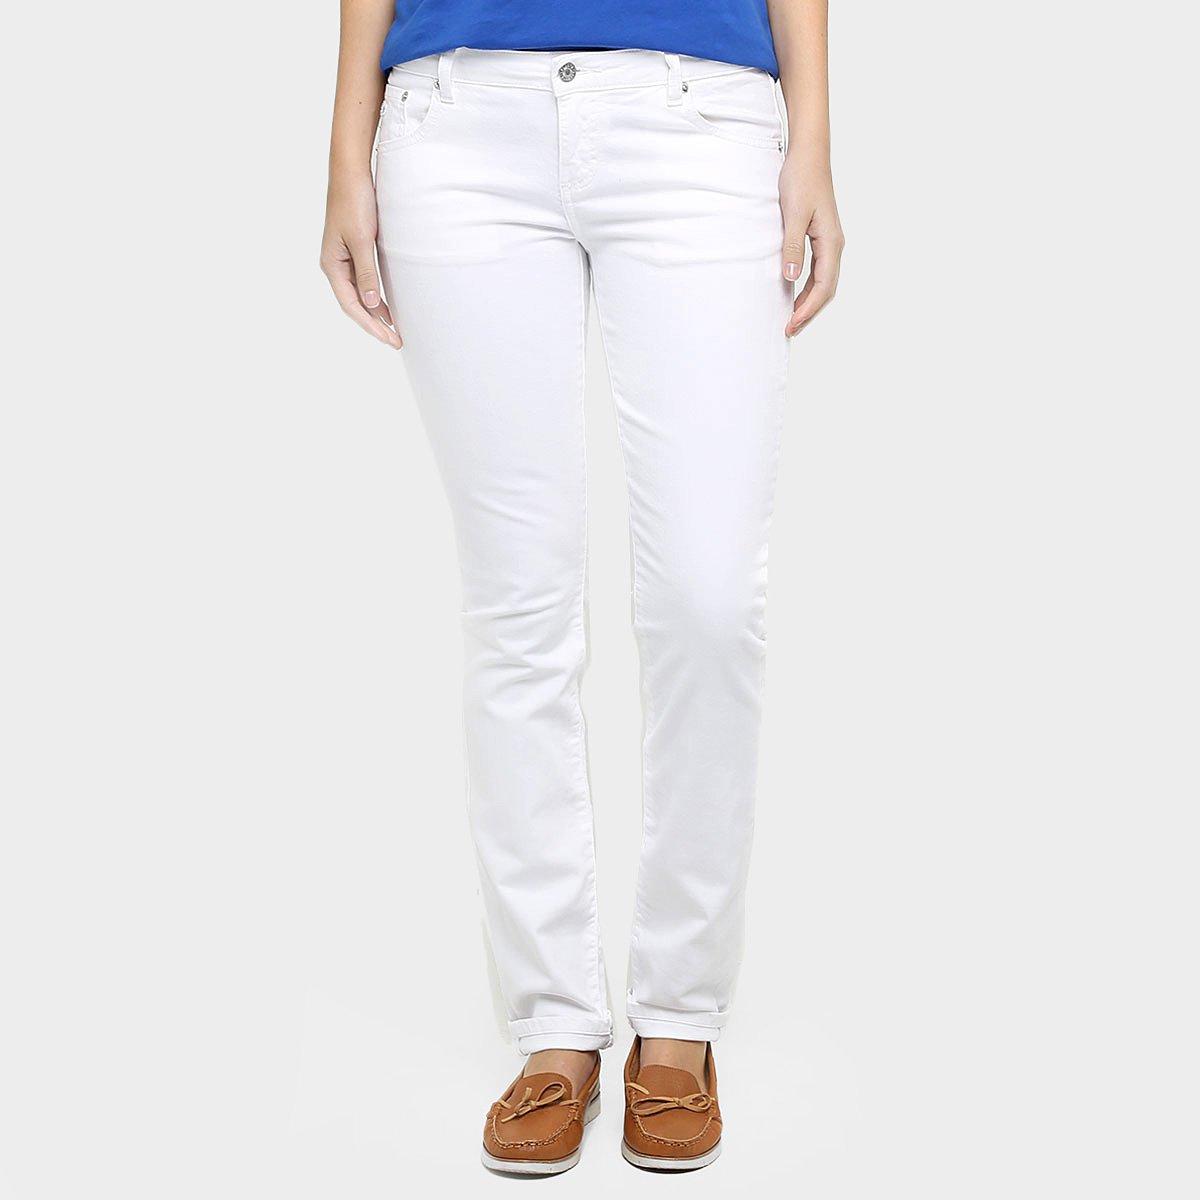 Calça Jeans Lacoste Skinny Fit Color - Compre Agora   Netshoes d9bdbfe9aa